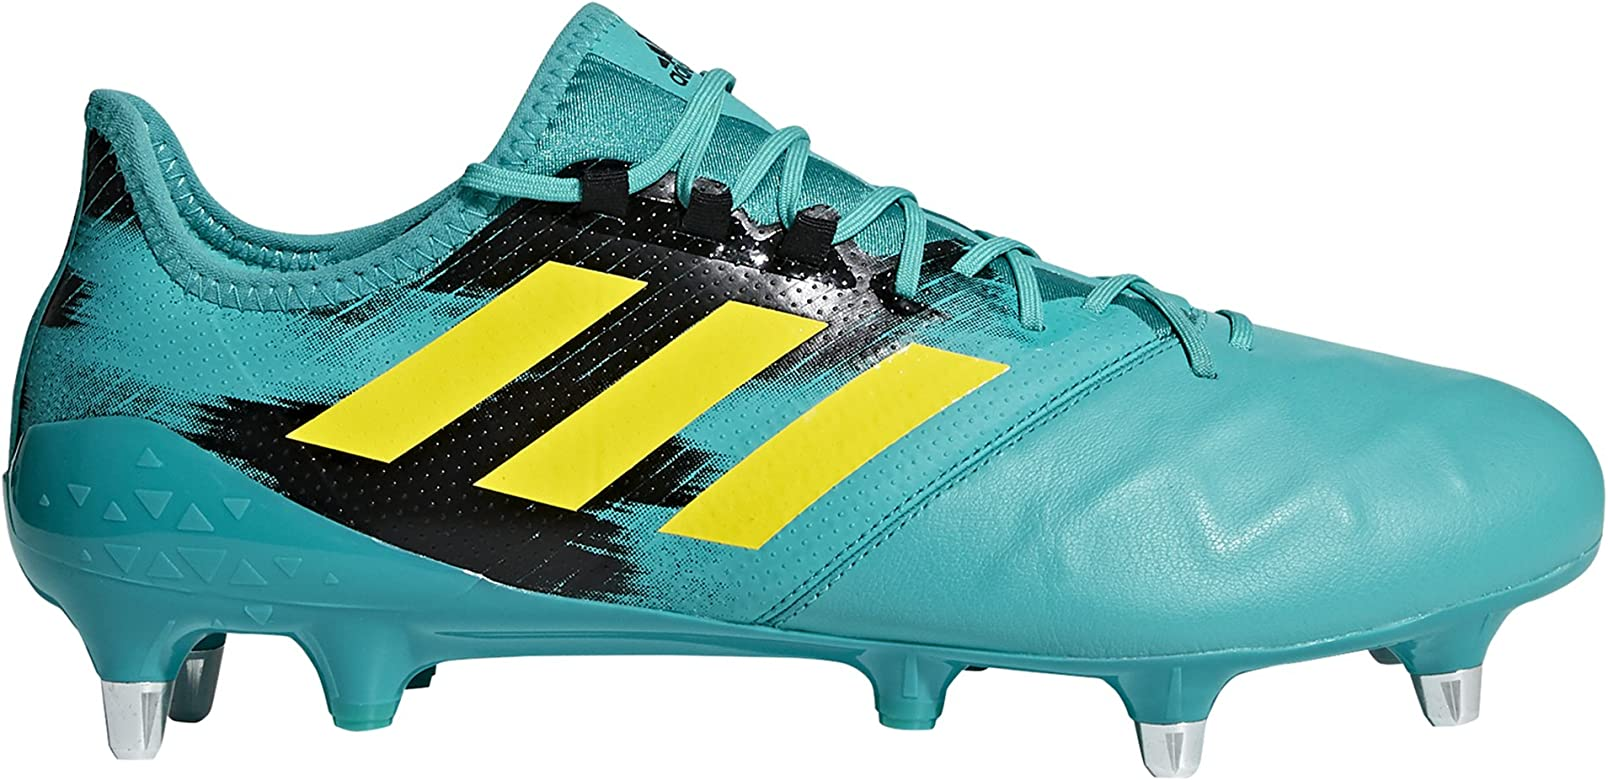 362073c35b4d1 adidas Kakari Light SG Chaussures de Rugby Homme, Multicolore  (Agalre/Amasho/Negbás